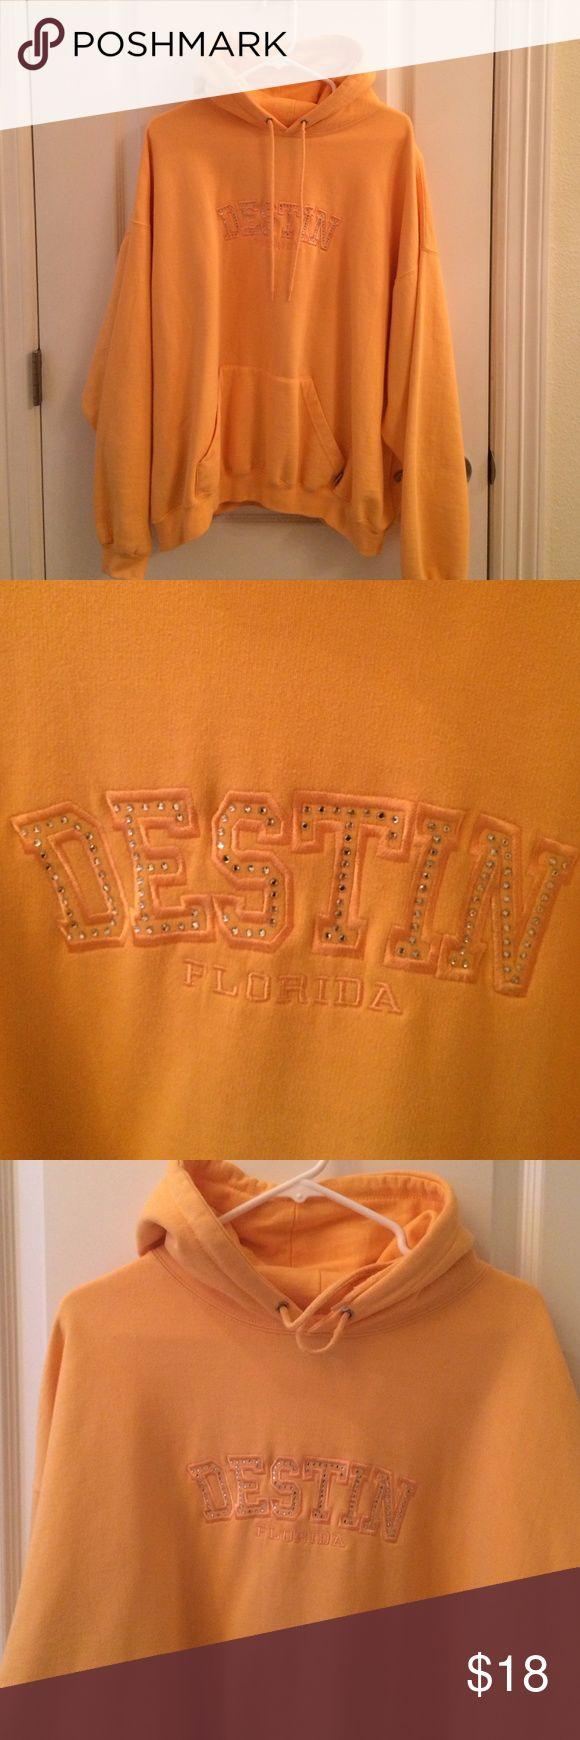 Hoodie jacket Very light orange pullover hoodie with Destin in stones on front. Tops Sweatshirts & Hoodies